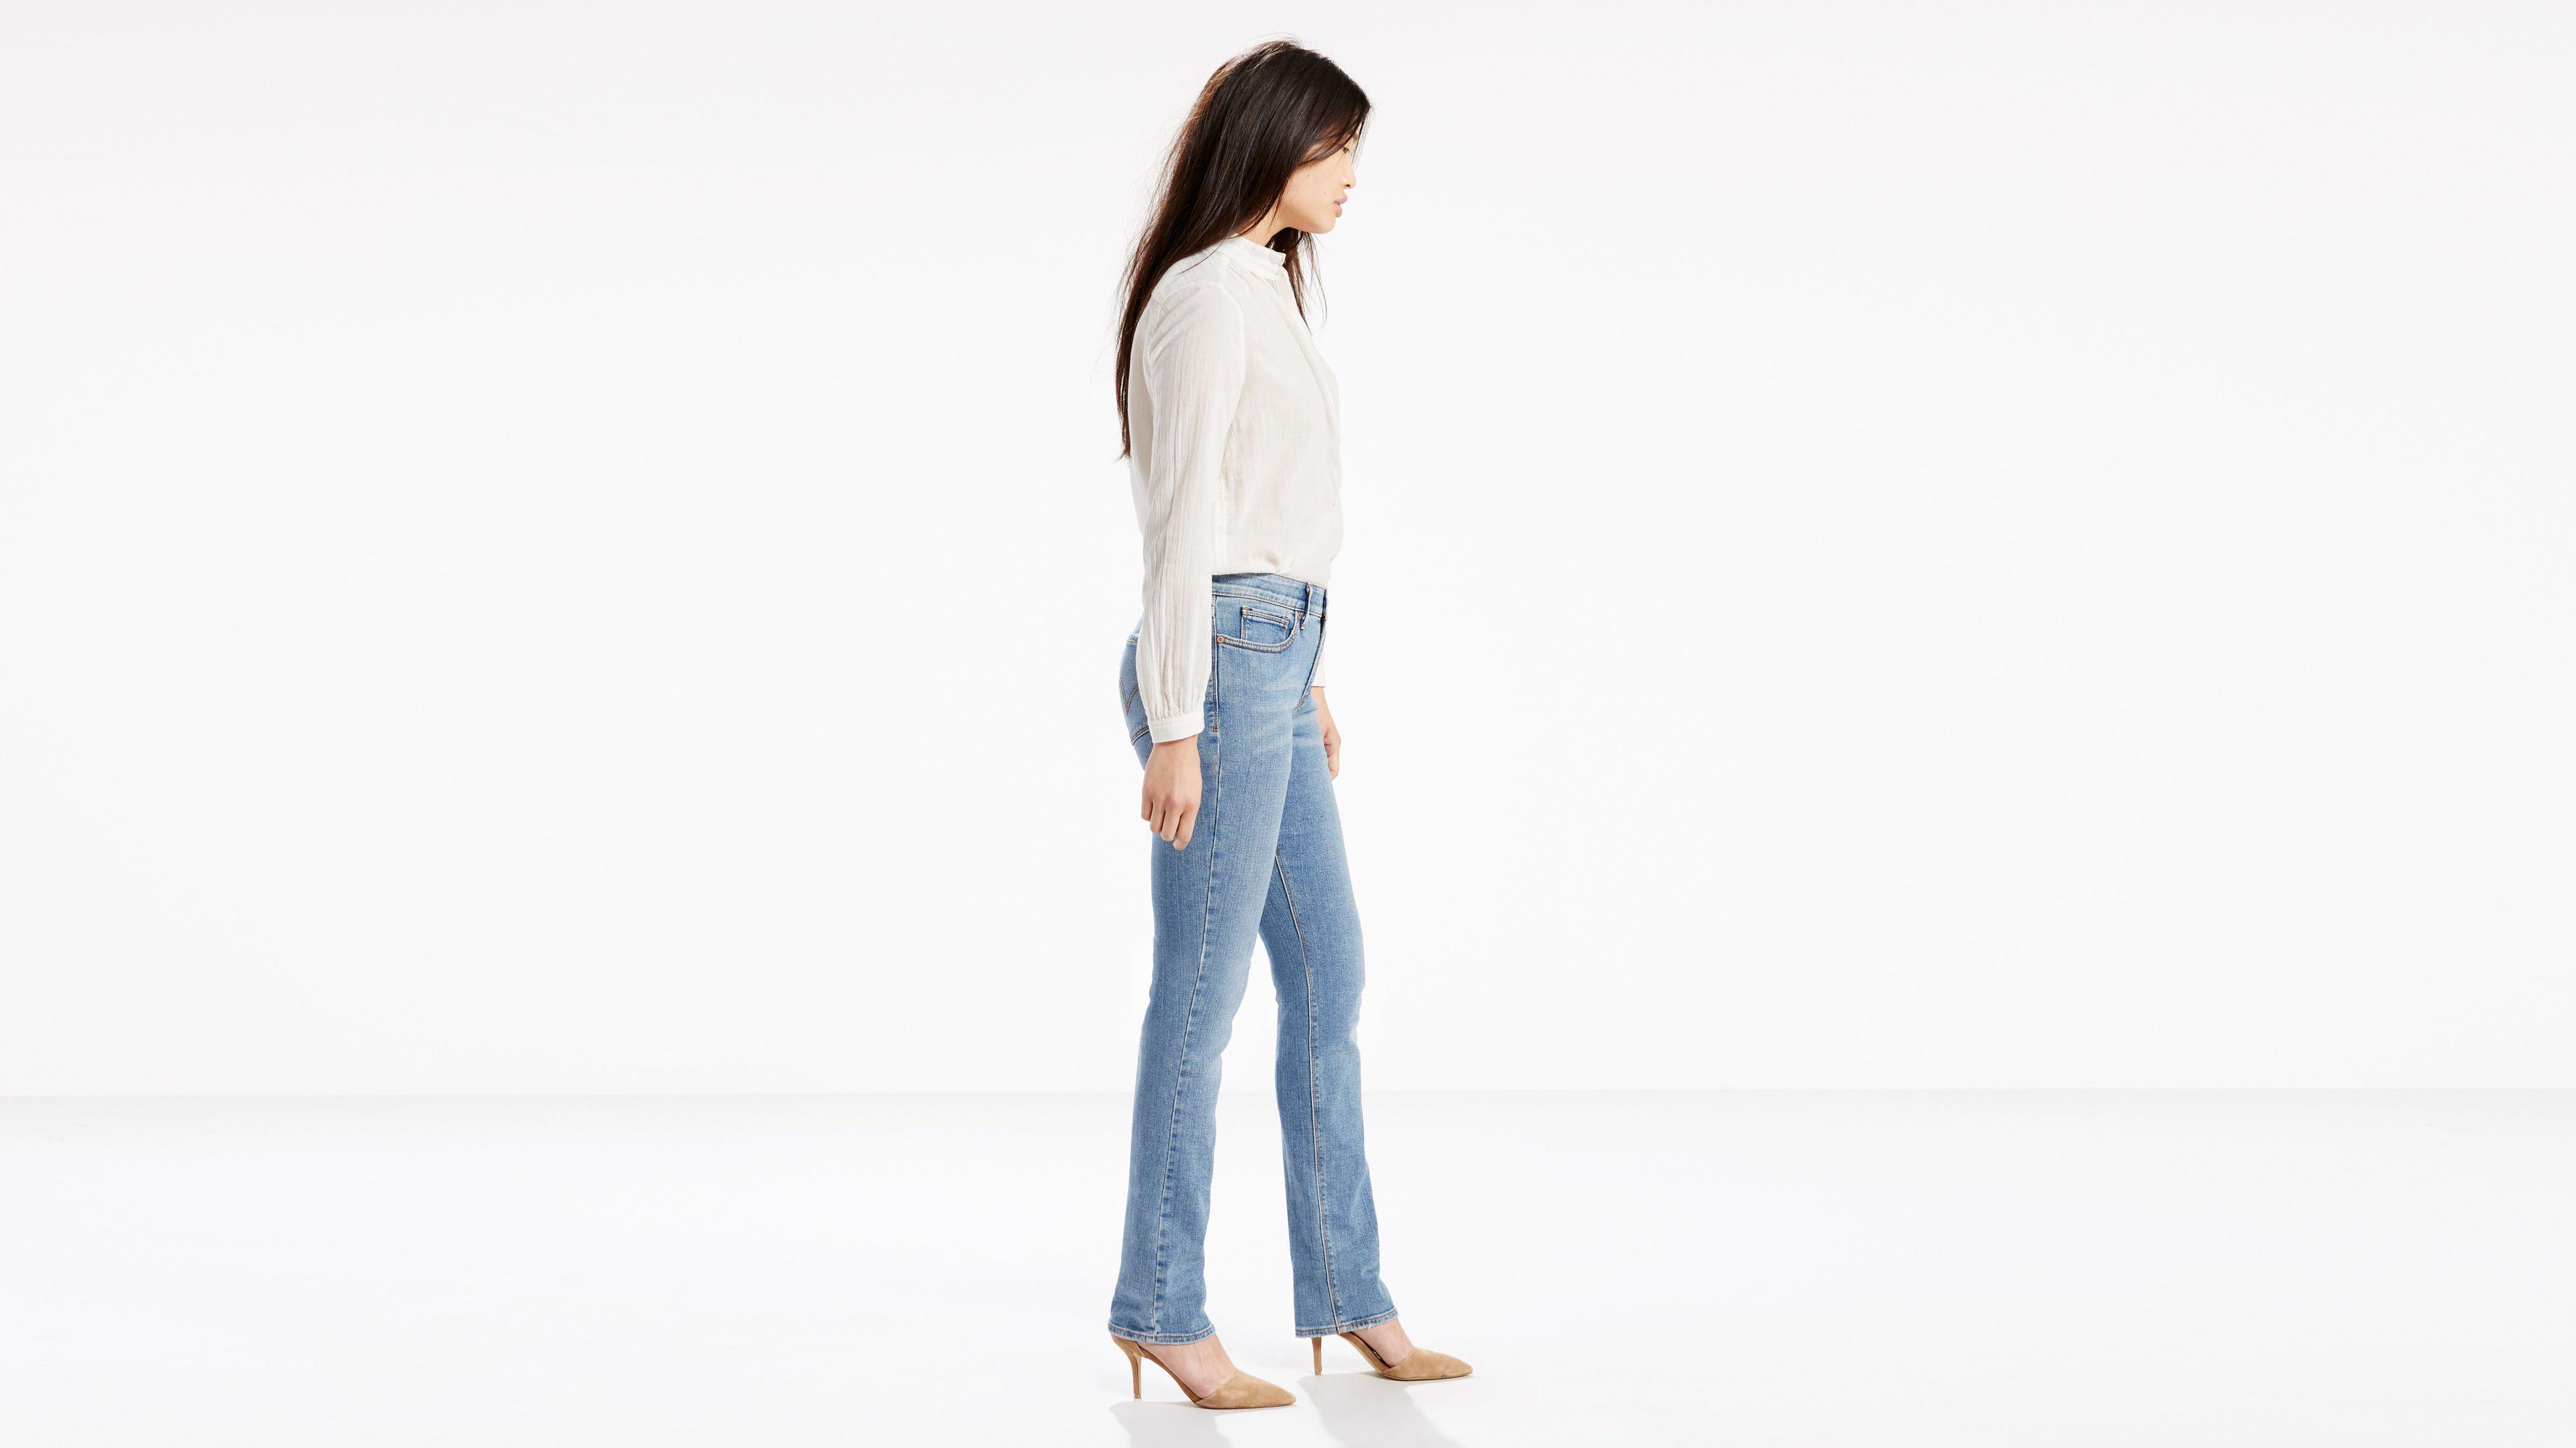 d43c38bf 525™ Perfect Waist Straight Jeans - Light Wash | Levi's® US